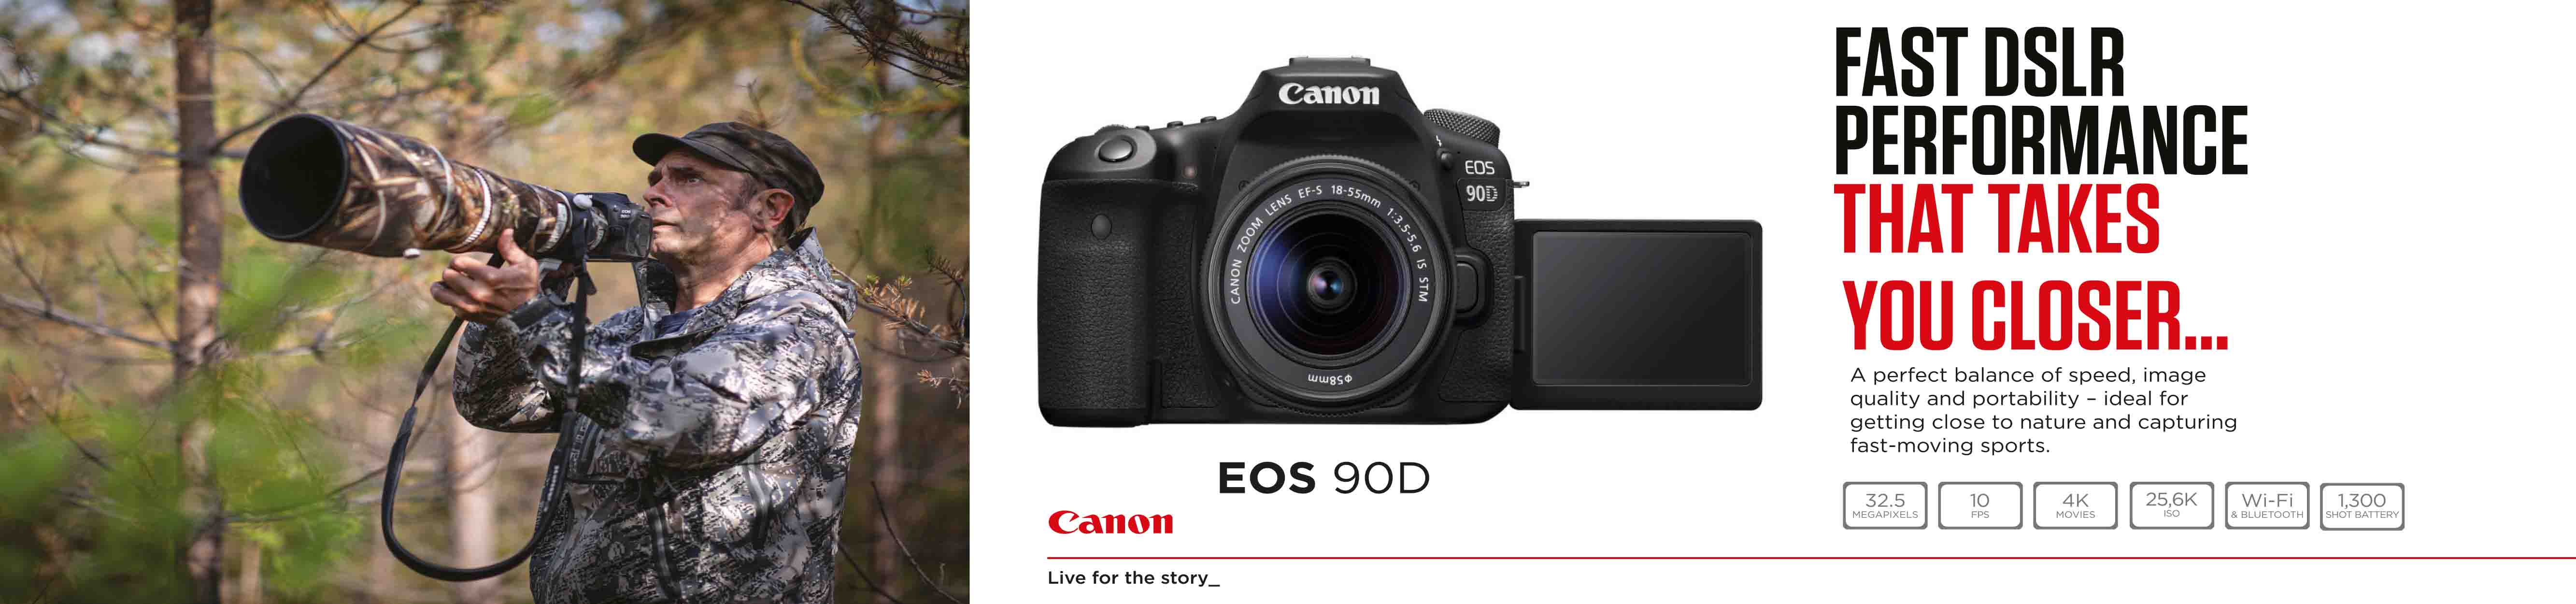 Cano Eos 90D